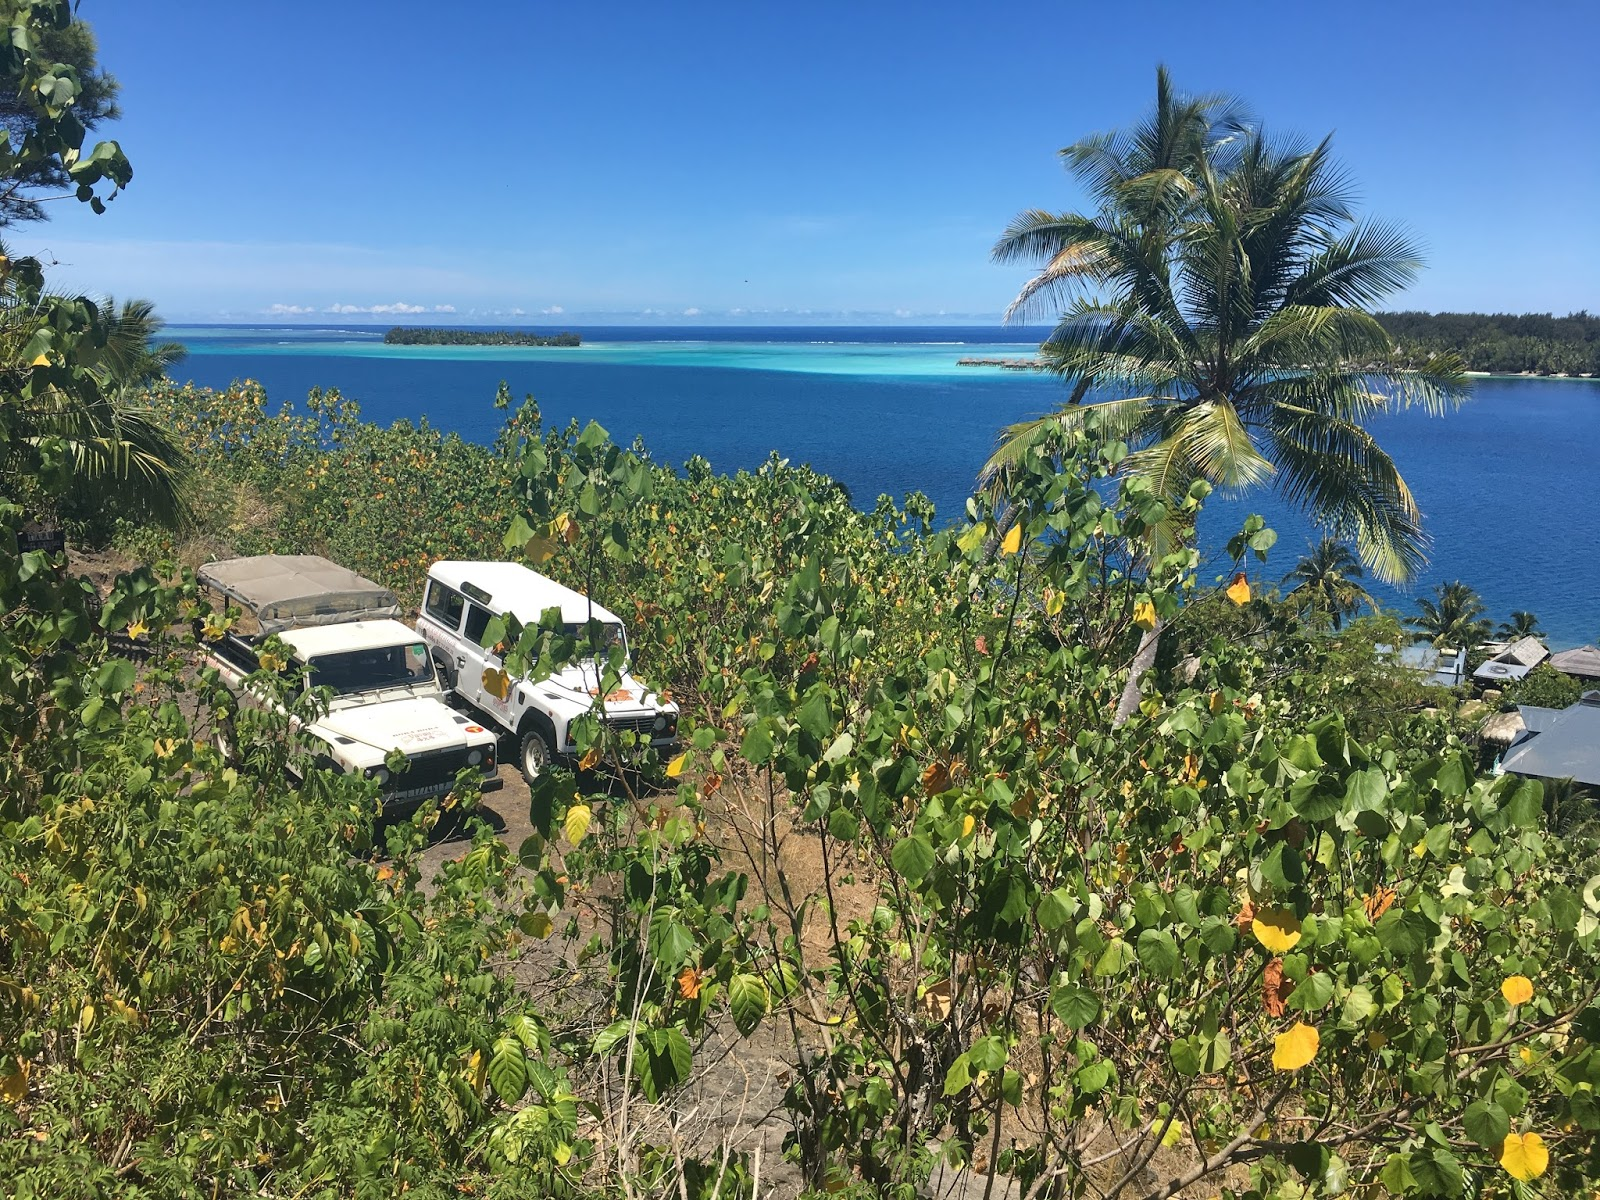 Bora Bora jeep safari tour